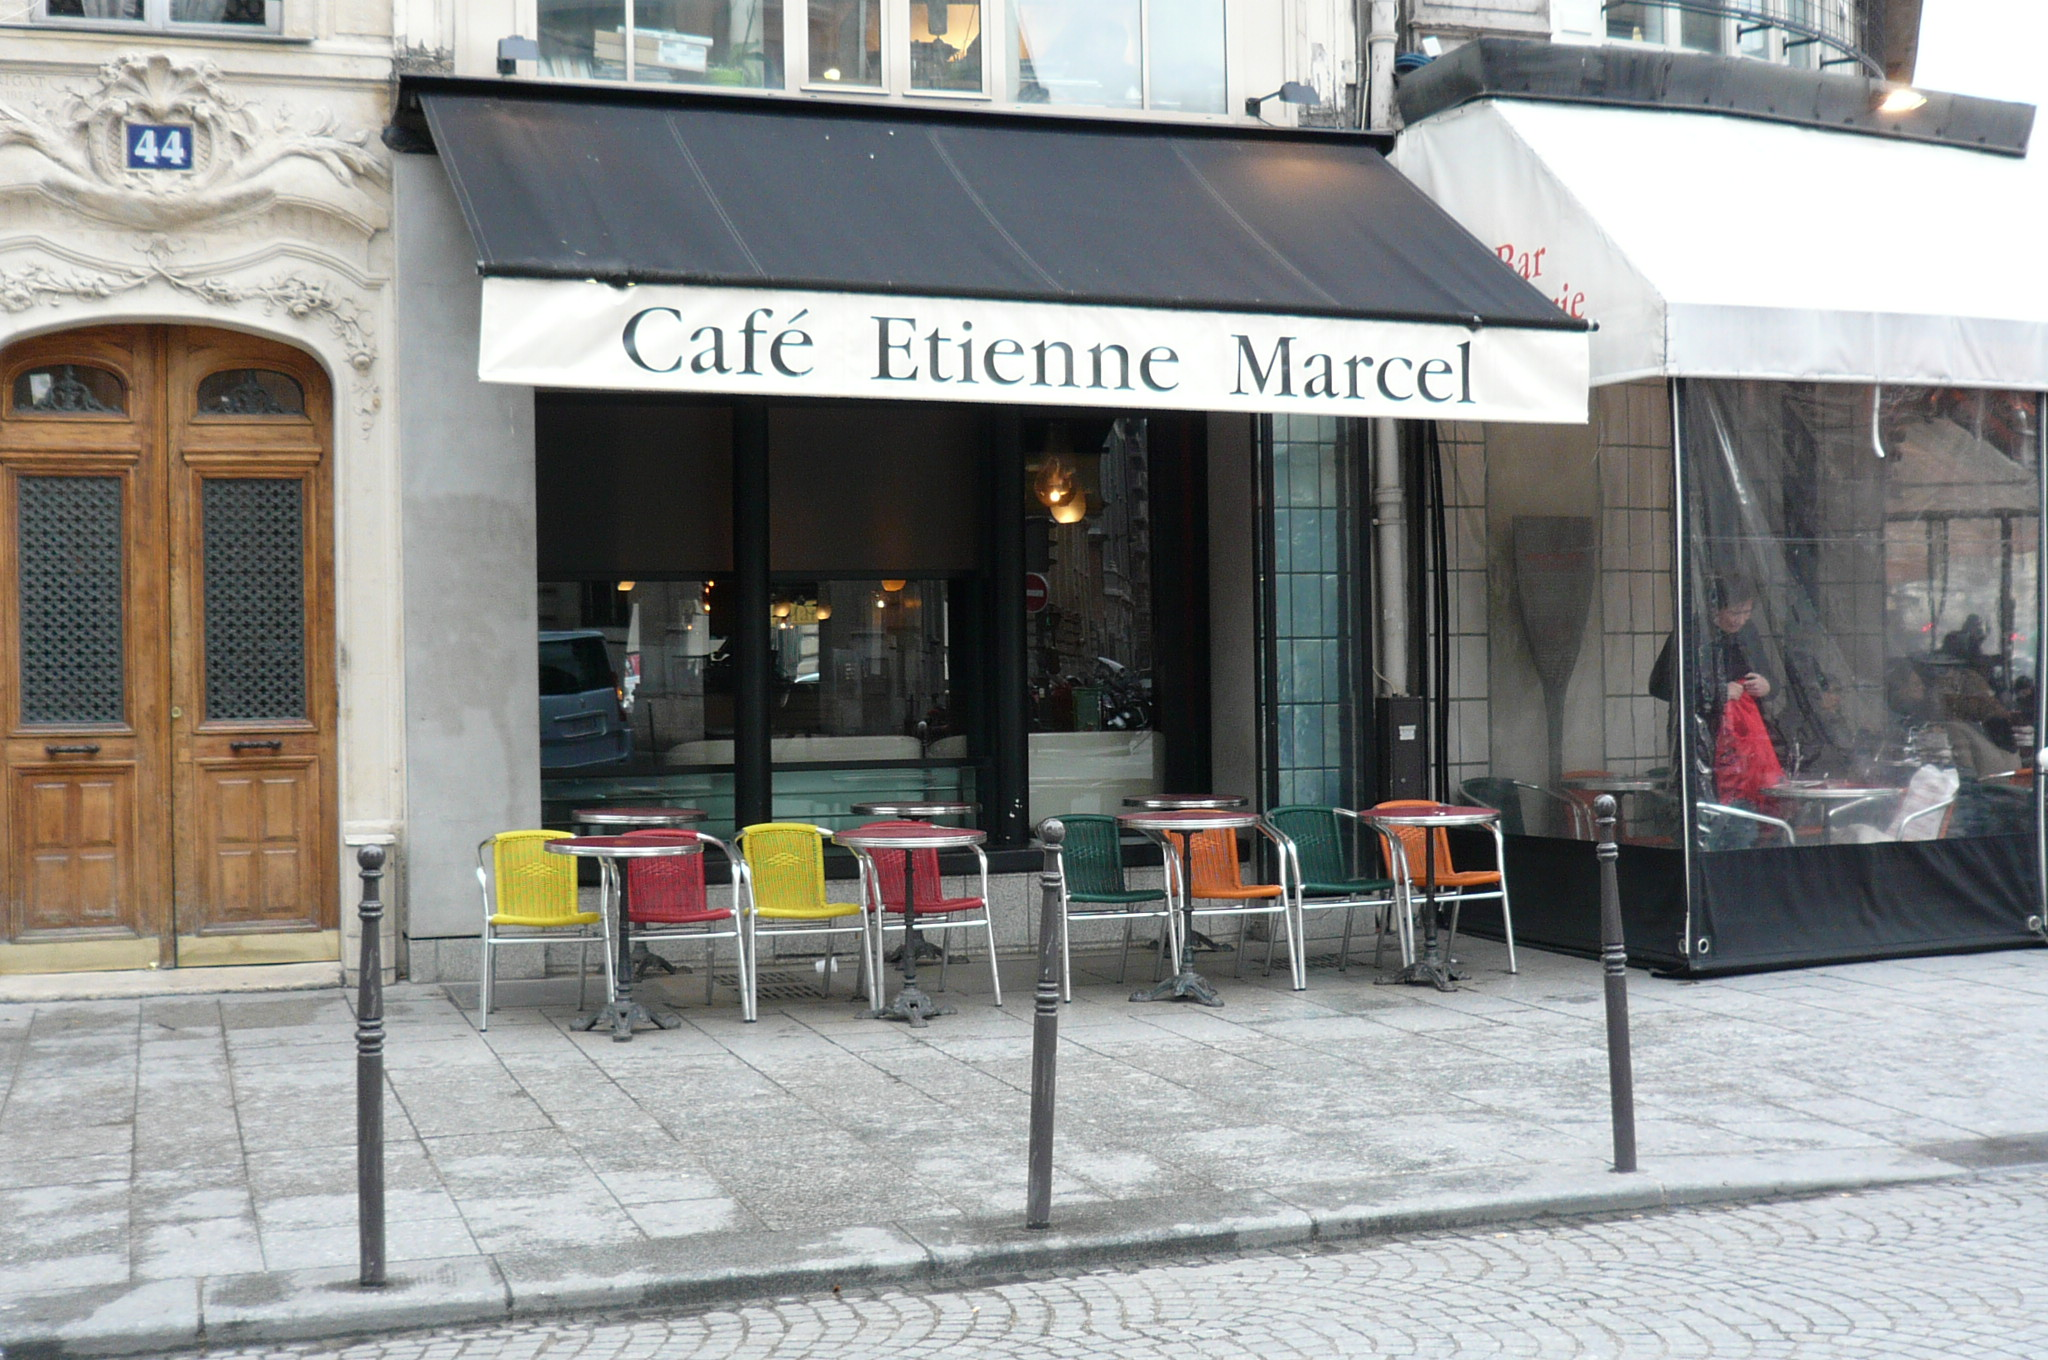 file caf etienne marcel rue tienne marcel rue montmartre paris jpg wikimedia commons. Black Bedroom Furniture Sets. Home Design Ideas